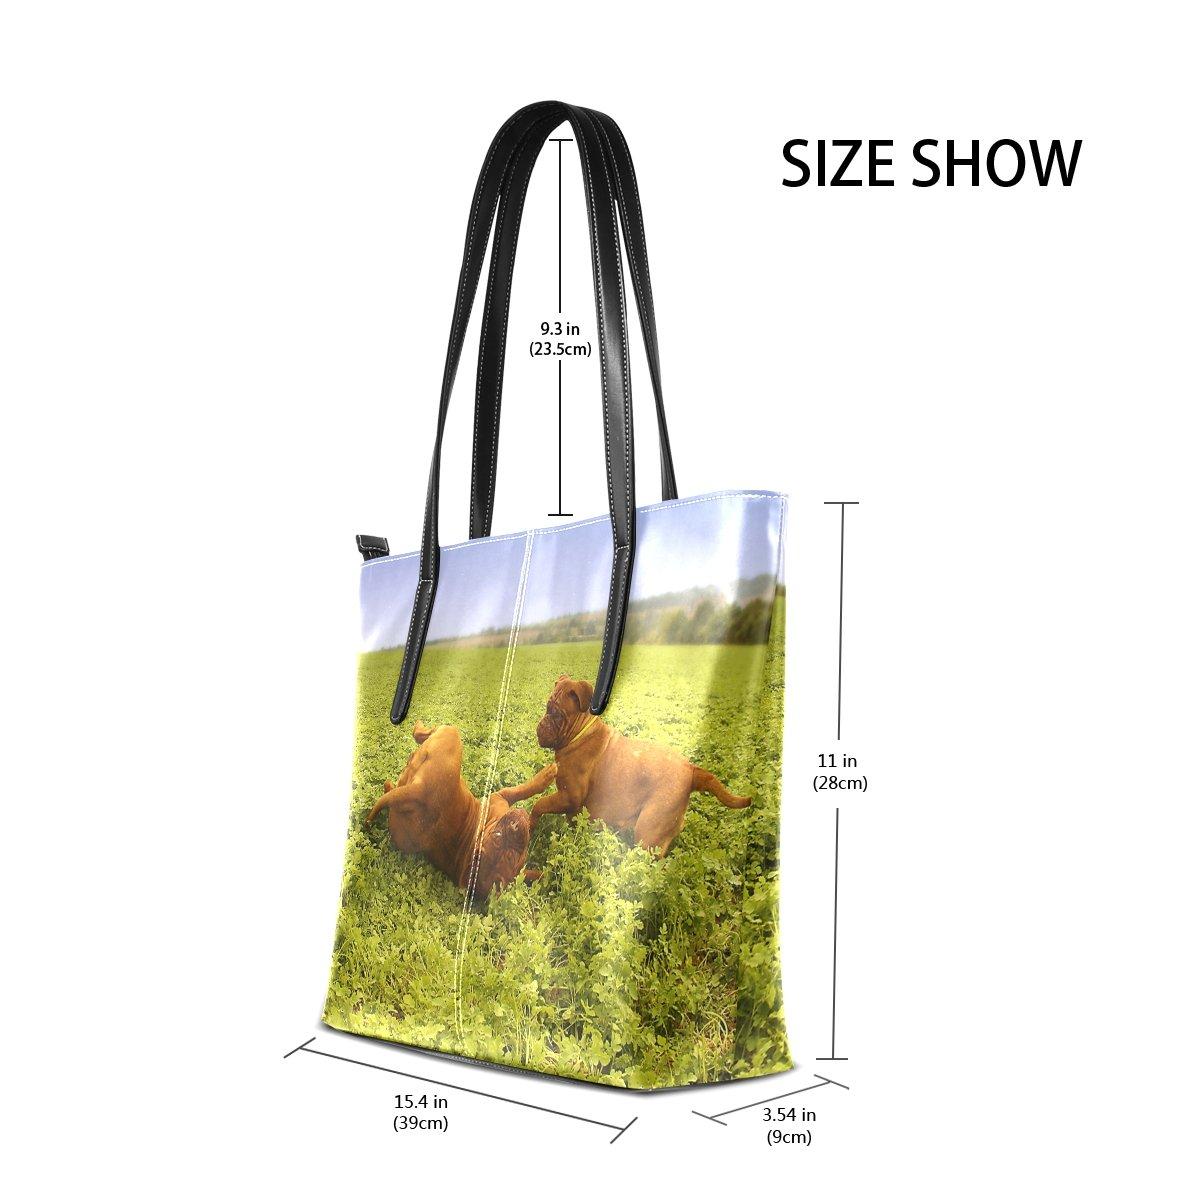 087ba74411a9 Amazon.com  DEYYA Game Darts Board Wheel Printing Top Handle Handbags Tote  Bag Shoulder Bag for Women  Shoes